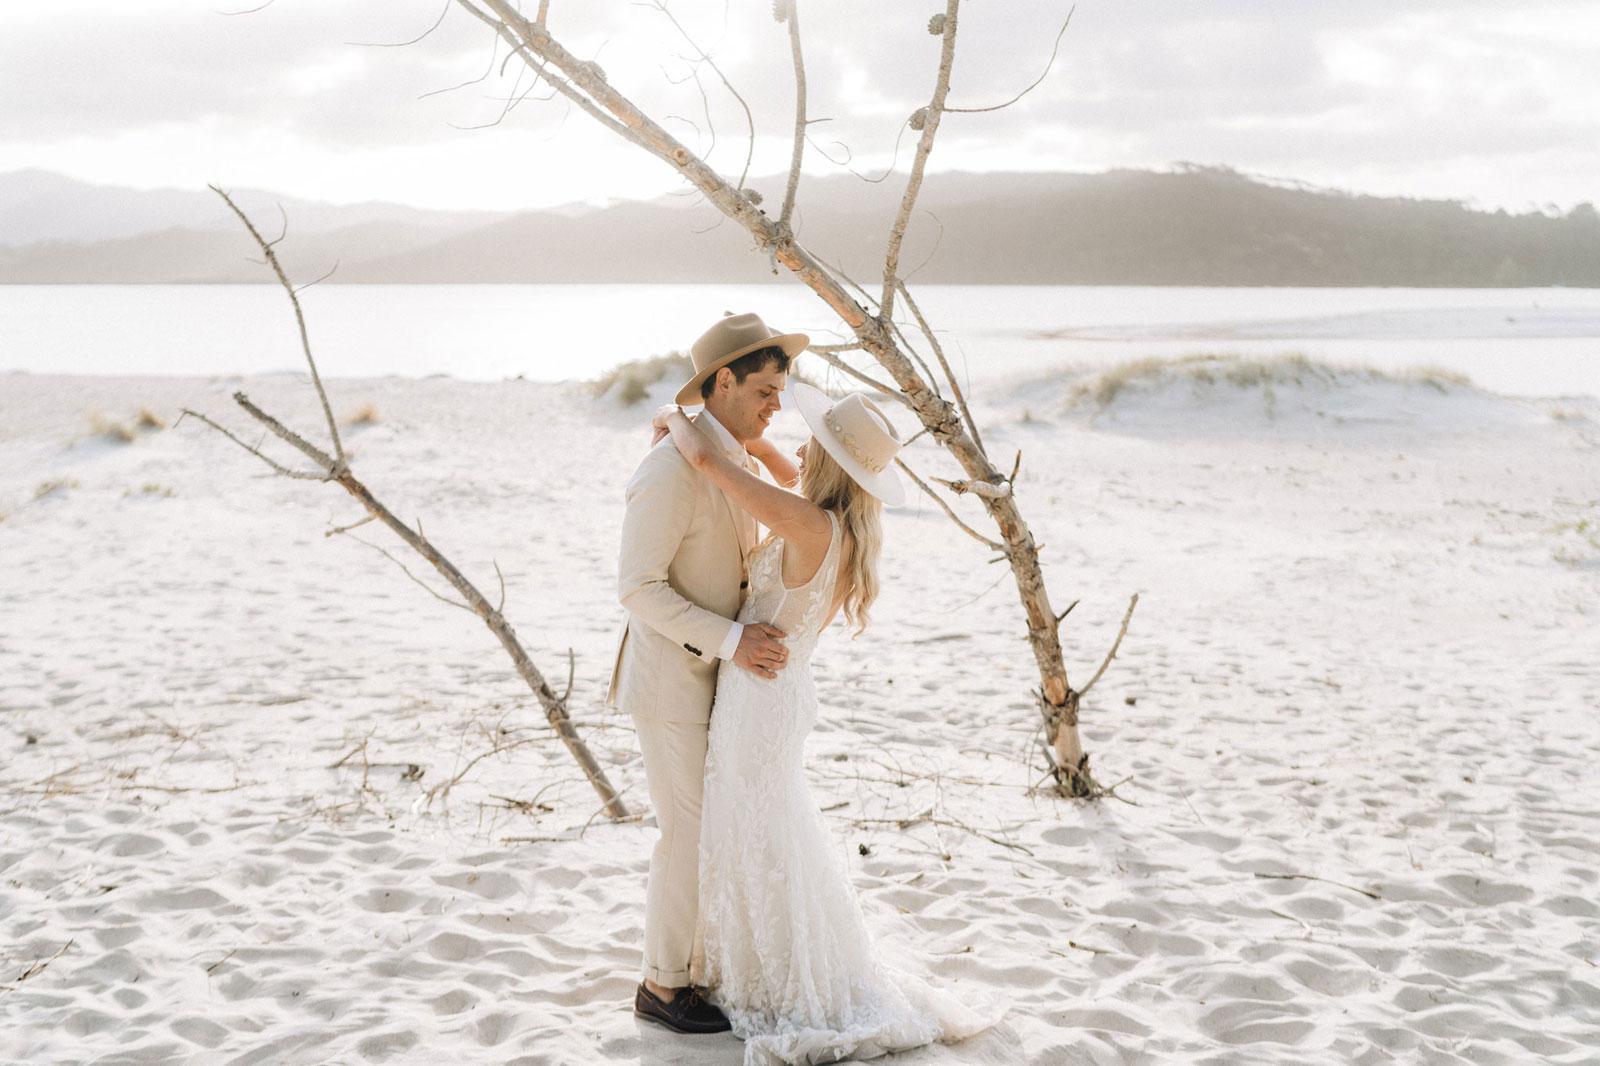 newfound-k-b-coromandel-wedding-photographers-090